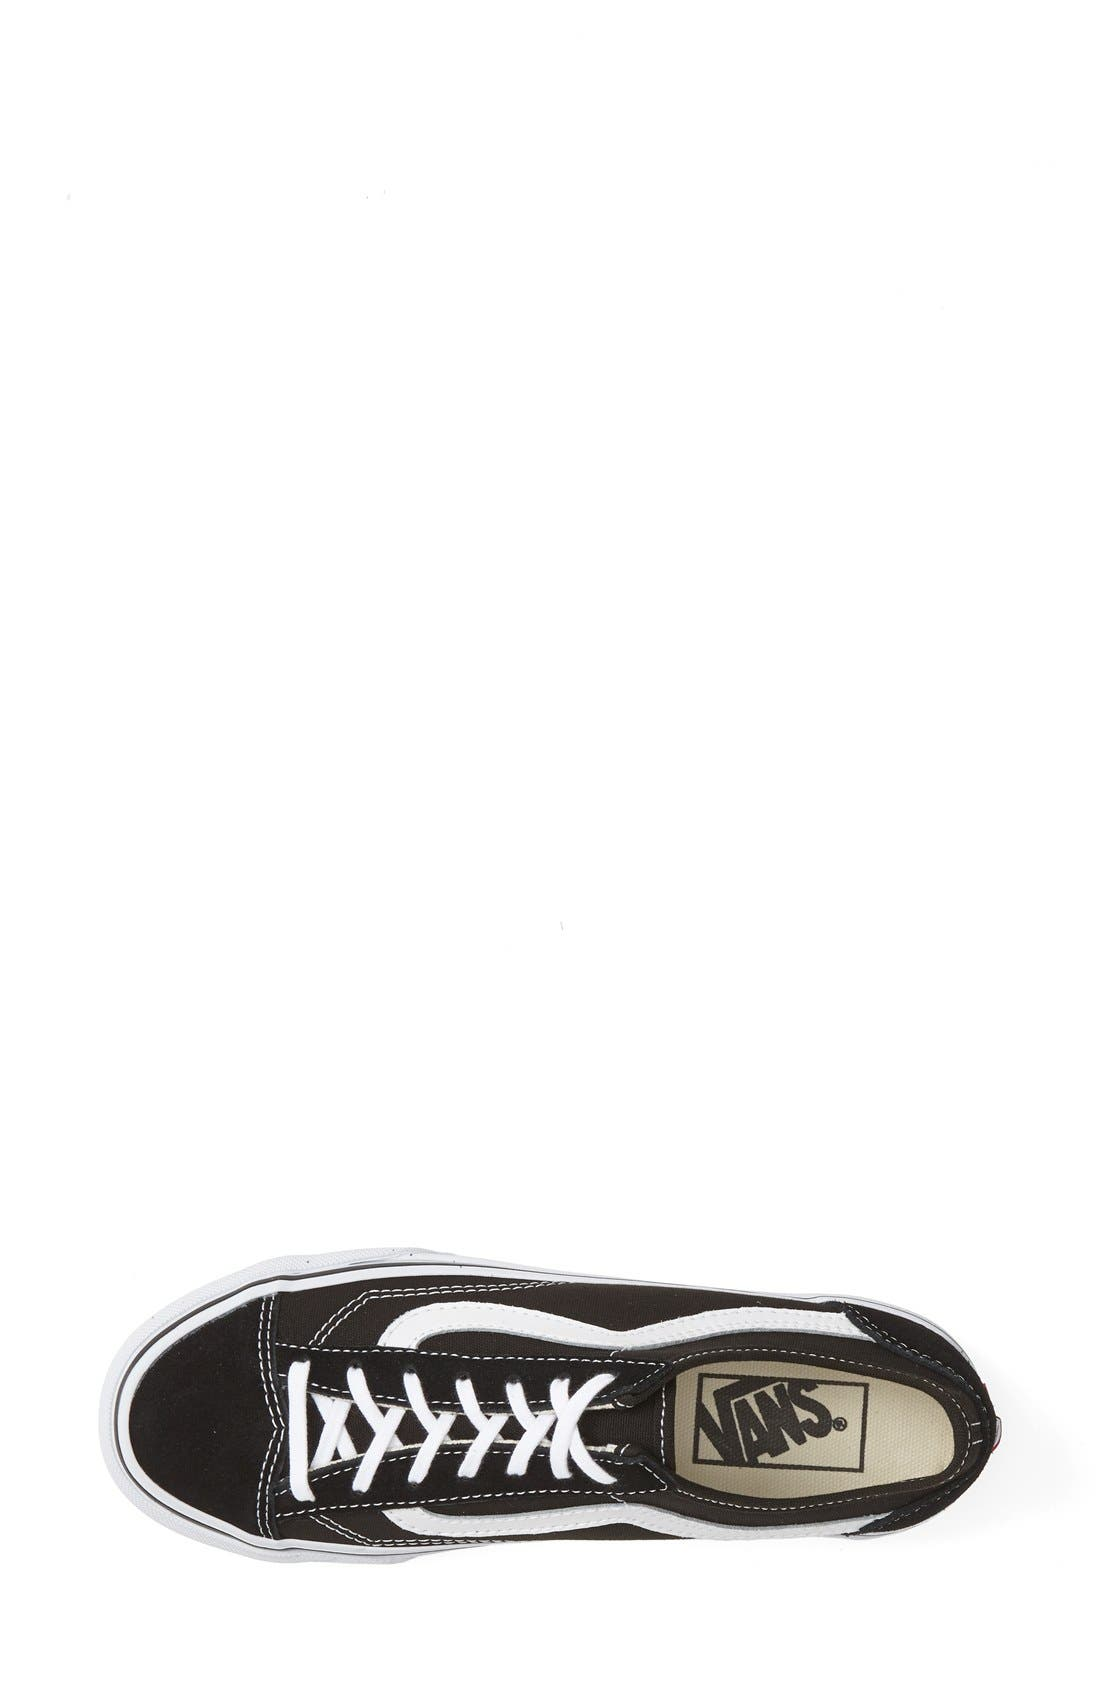 Alternate Image 3  - Vans 'Style 36' Sneaker (Women)